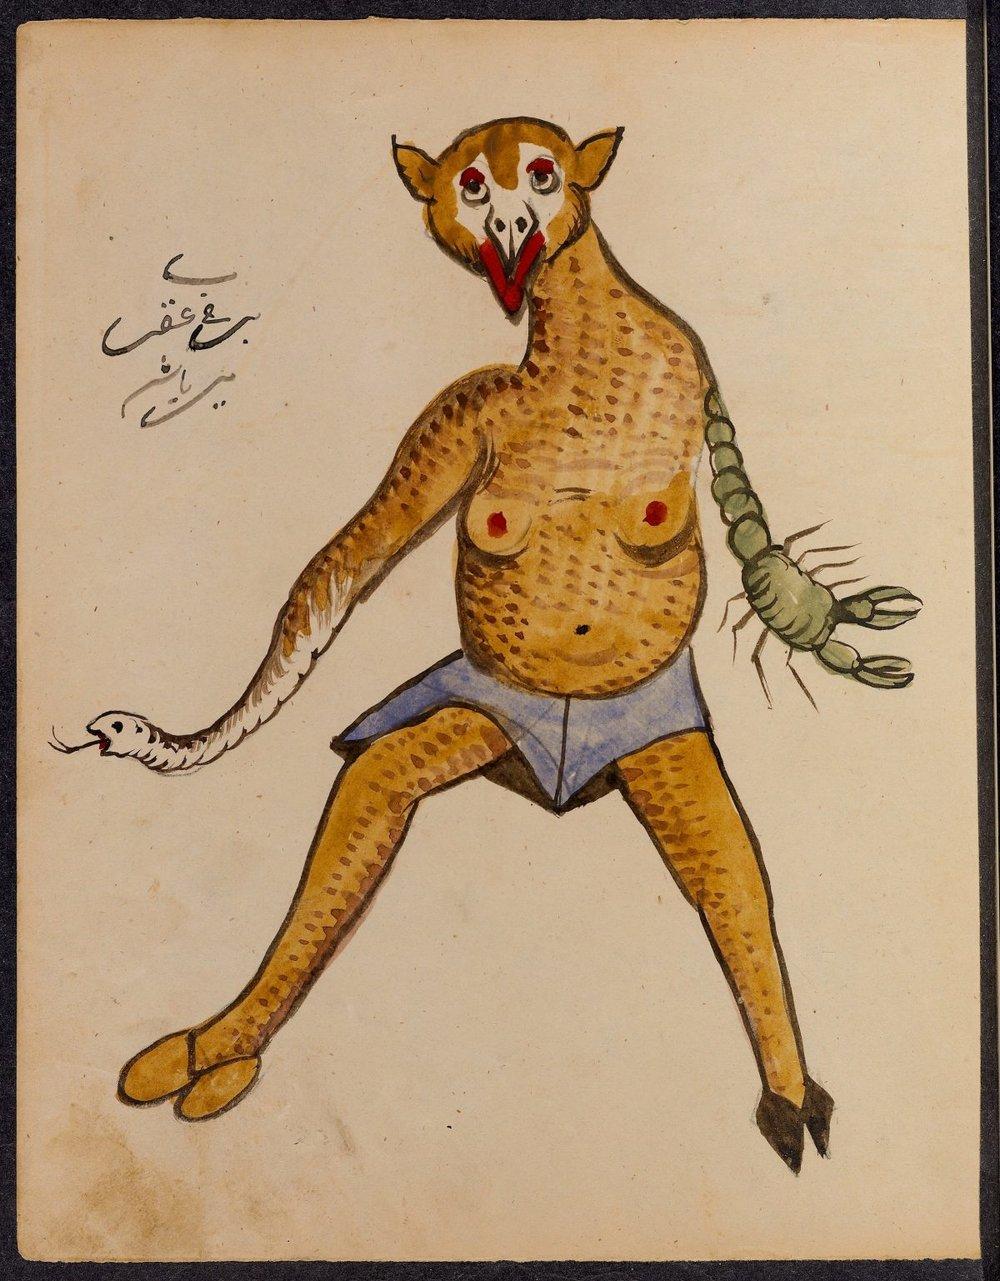 Demons-iran-5-1200x1537.jpg